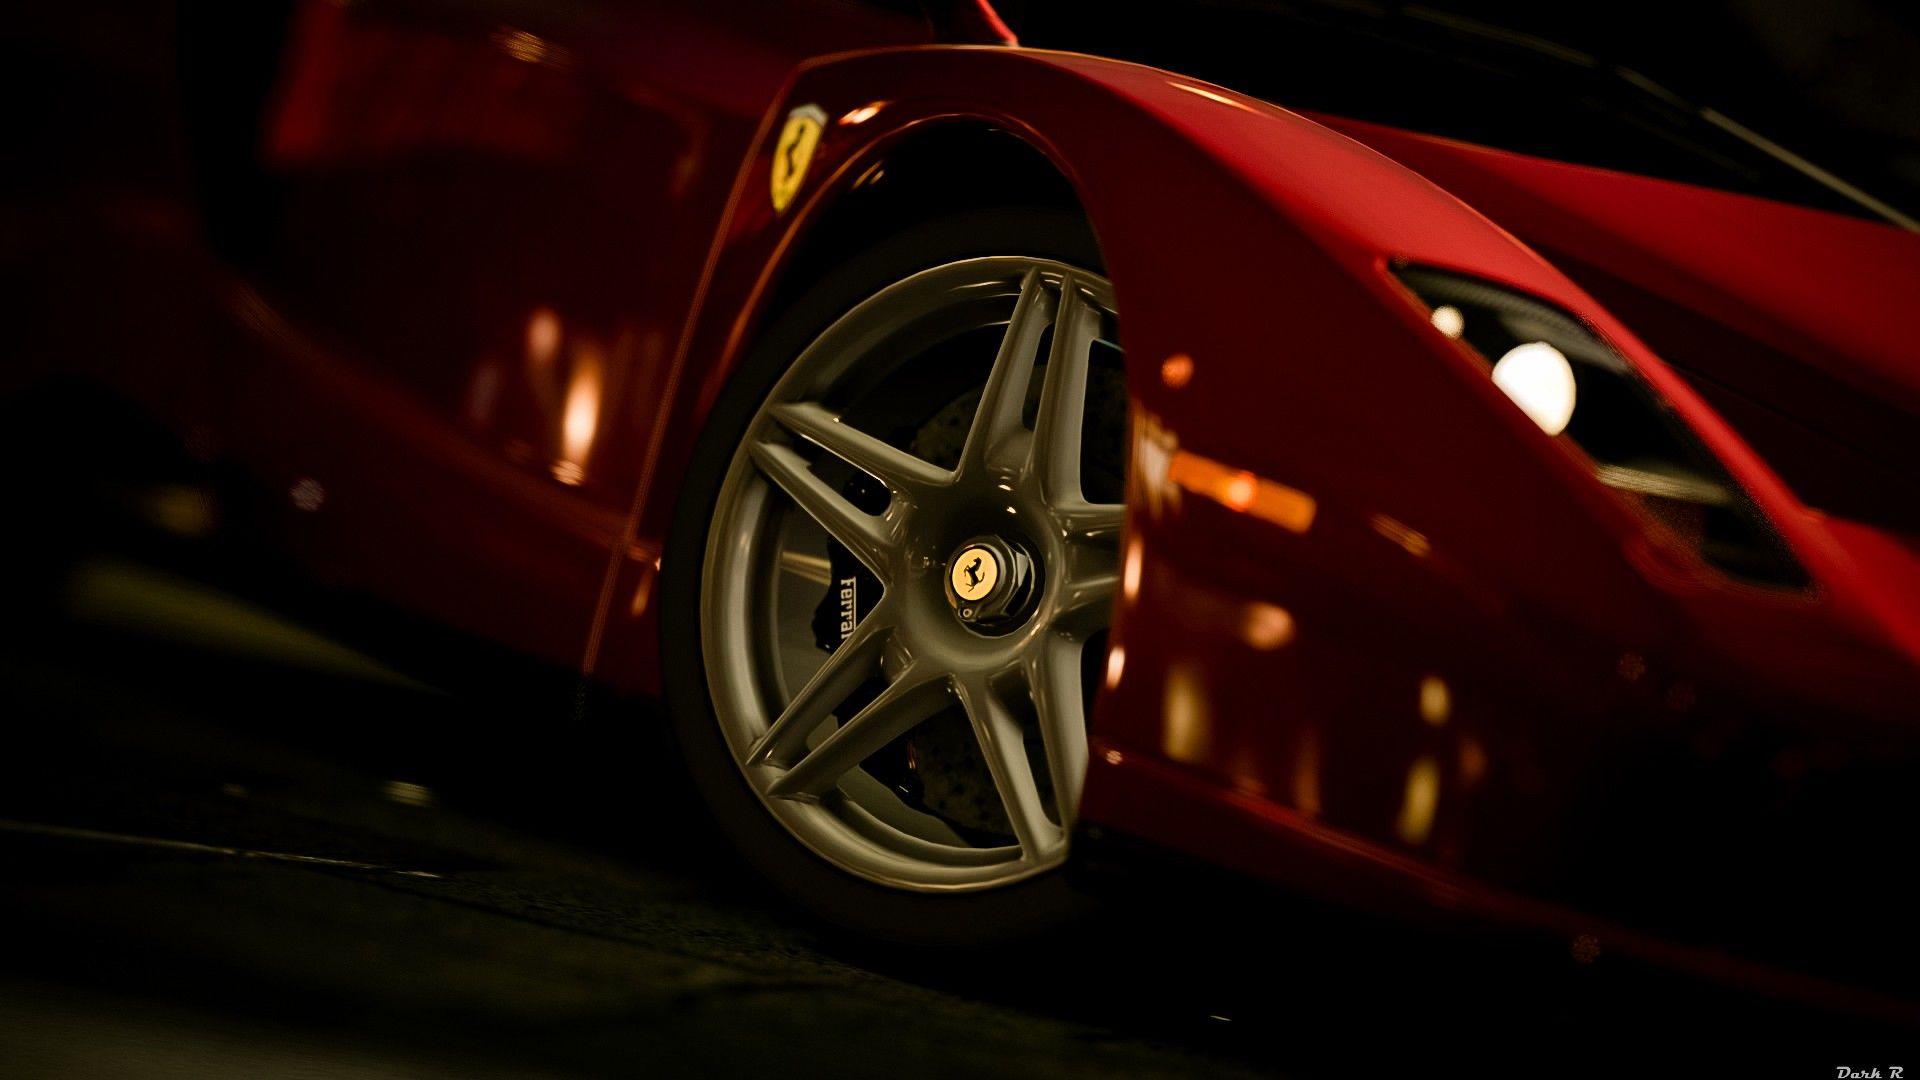 Ferrari Wheels 1080p Hd Wallpaper Car Ferrari Ferrari Car Car Wallpapers